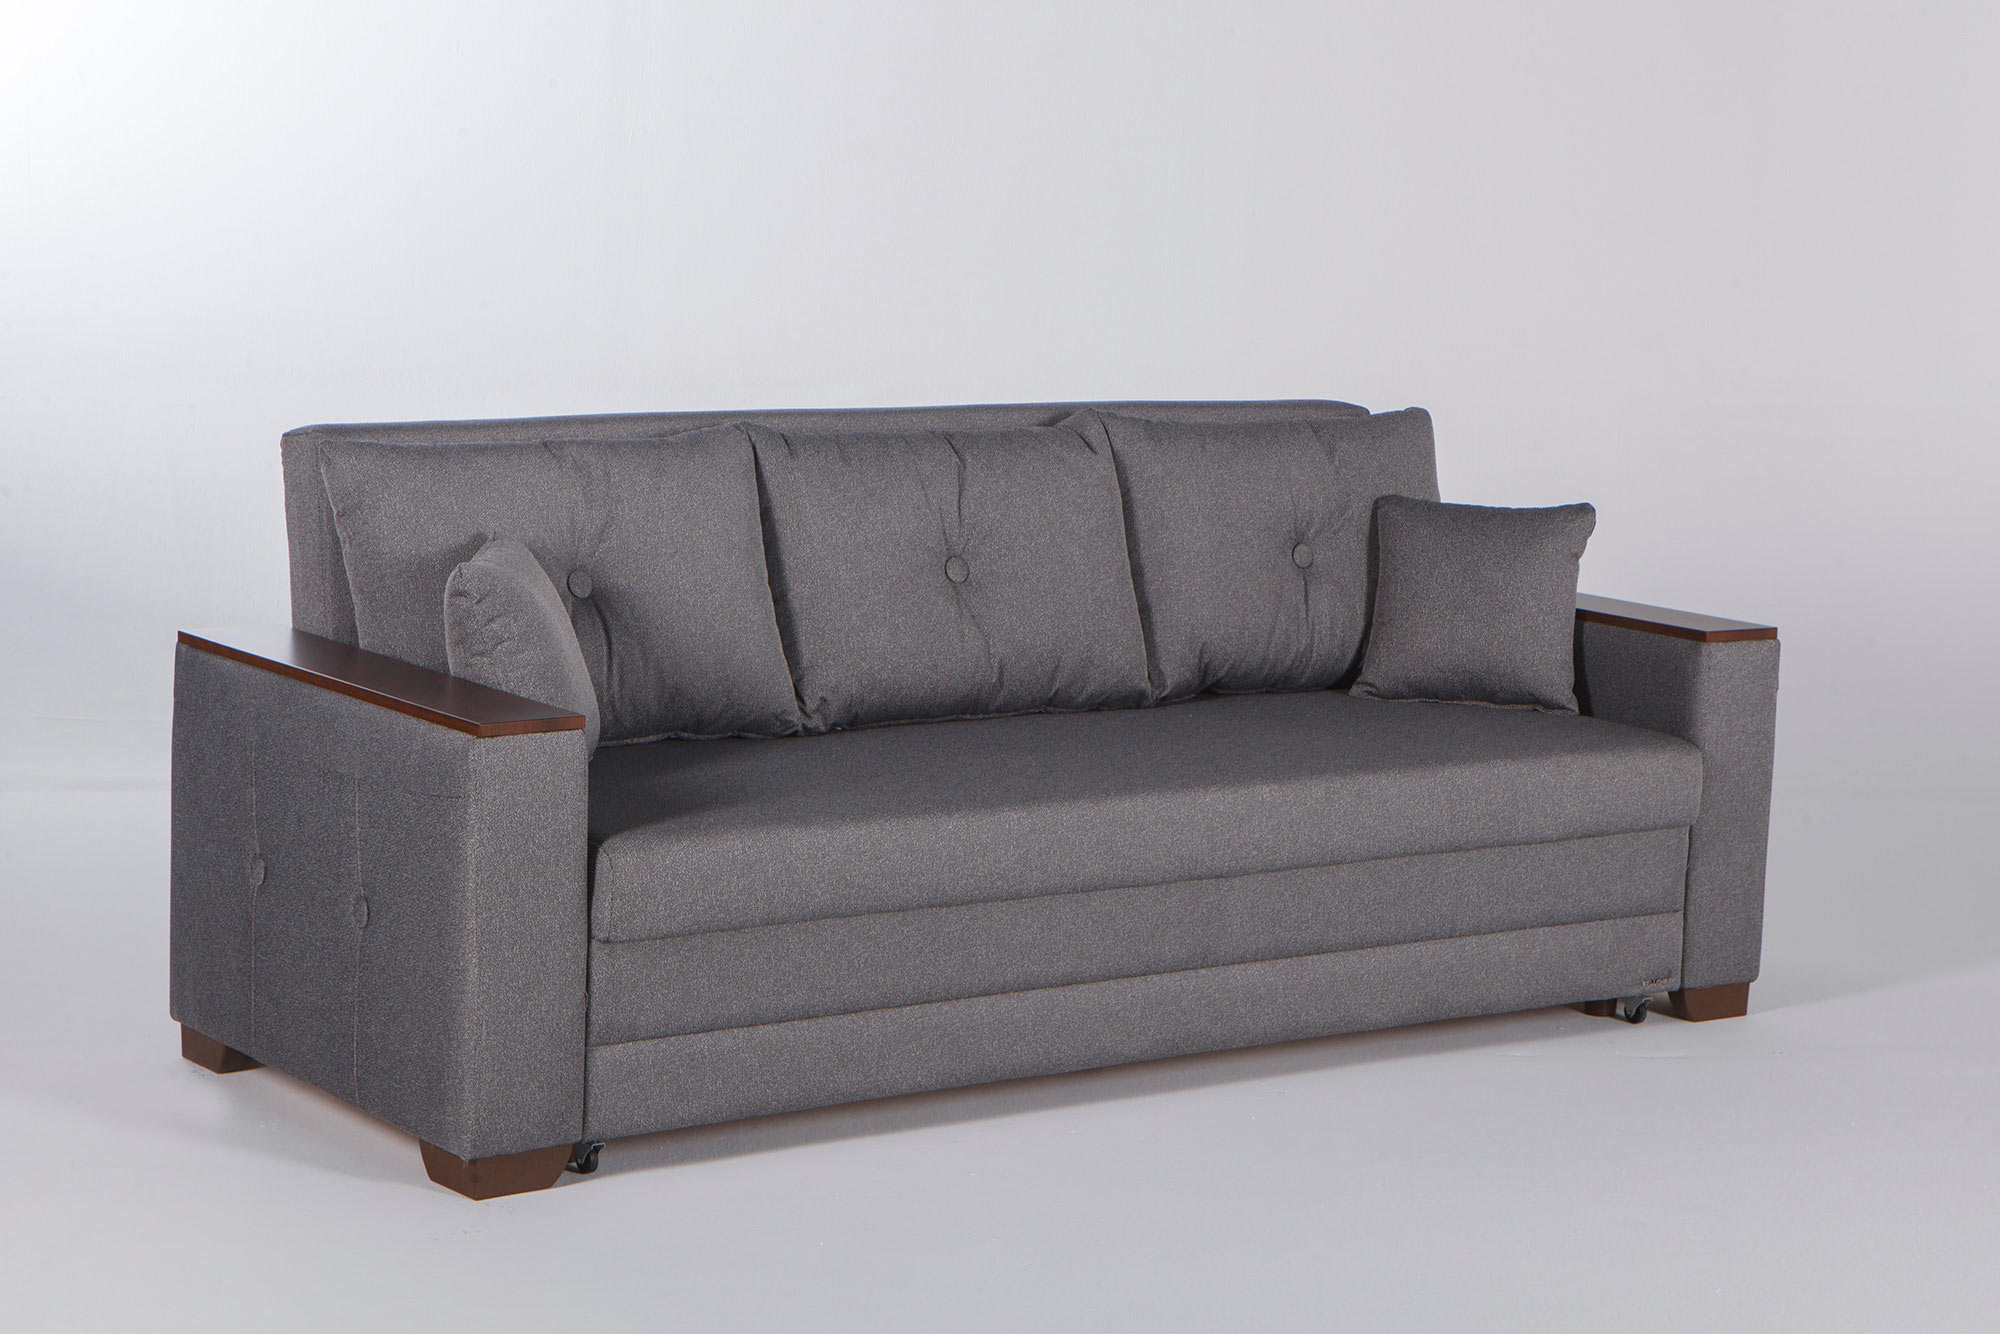 Nantes Seramo Gray Convertible Sofa Bed By Istikbal Furniture